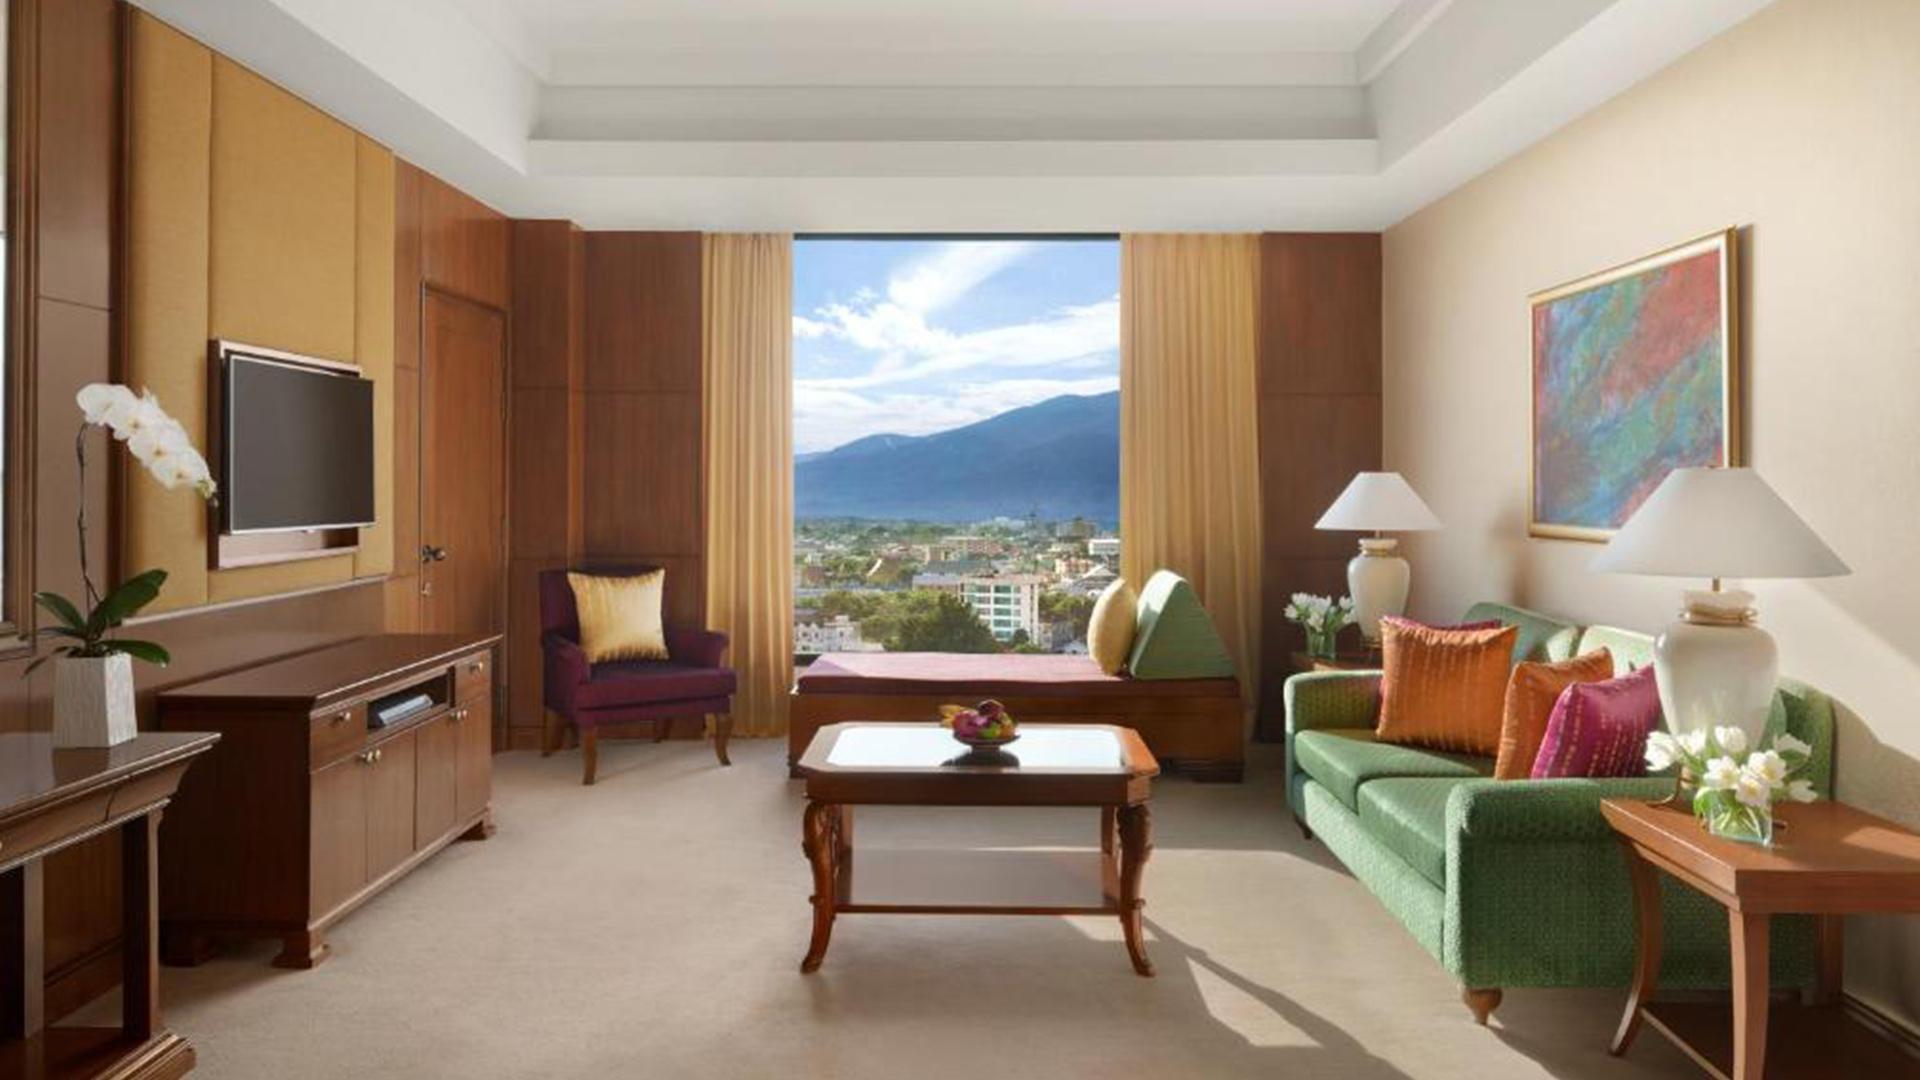 Executive Suite image 1 at Shangri-La Hotel, Chiang Mai by Amphoe Mueang Chiang Mai, Chang Wat Chiang Mai, Thailand